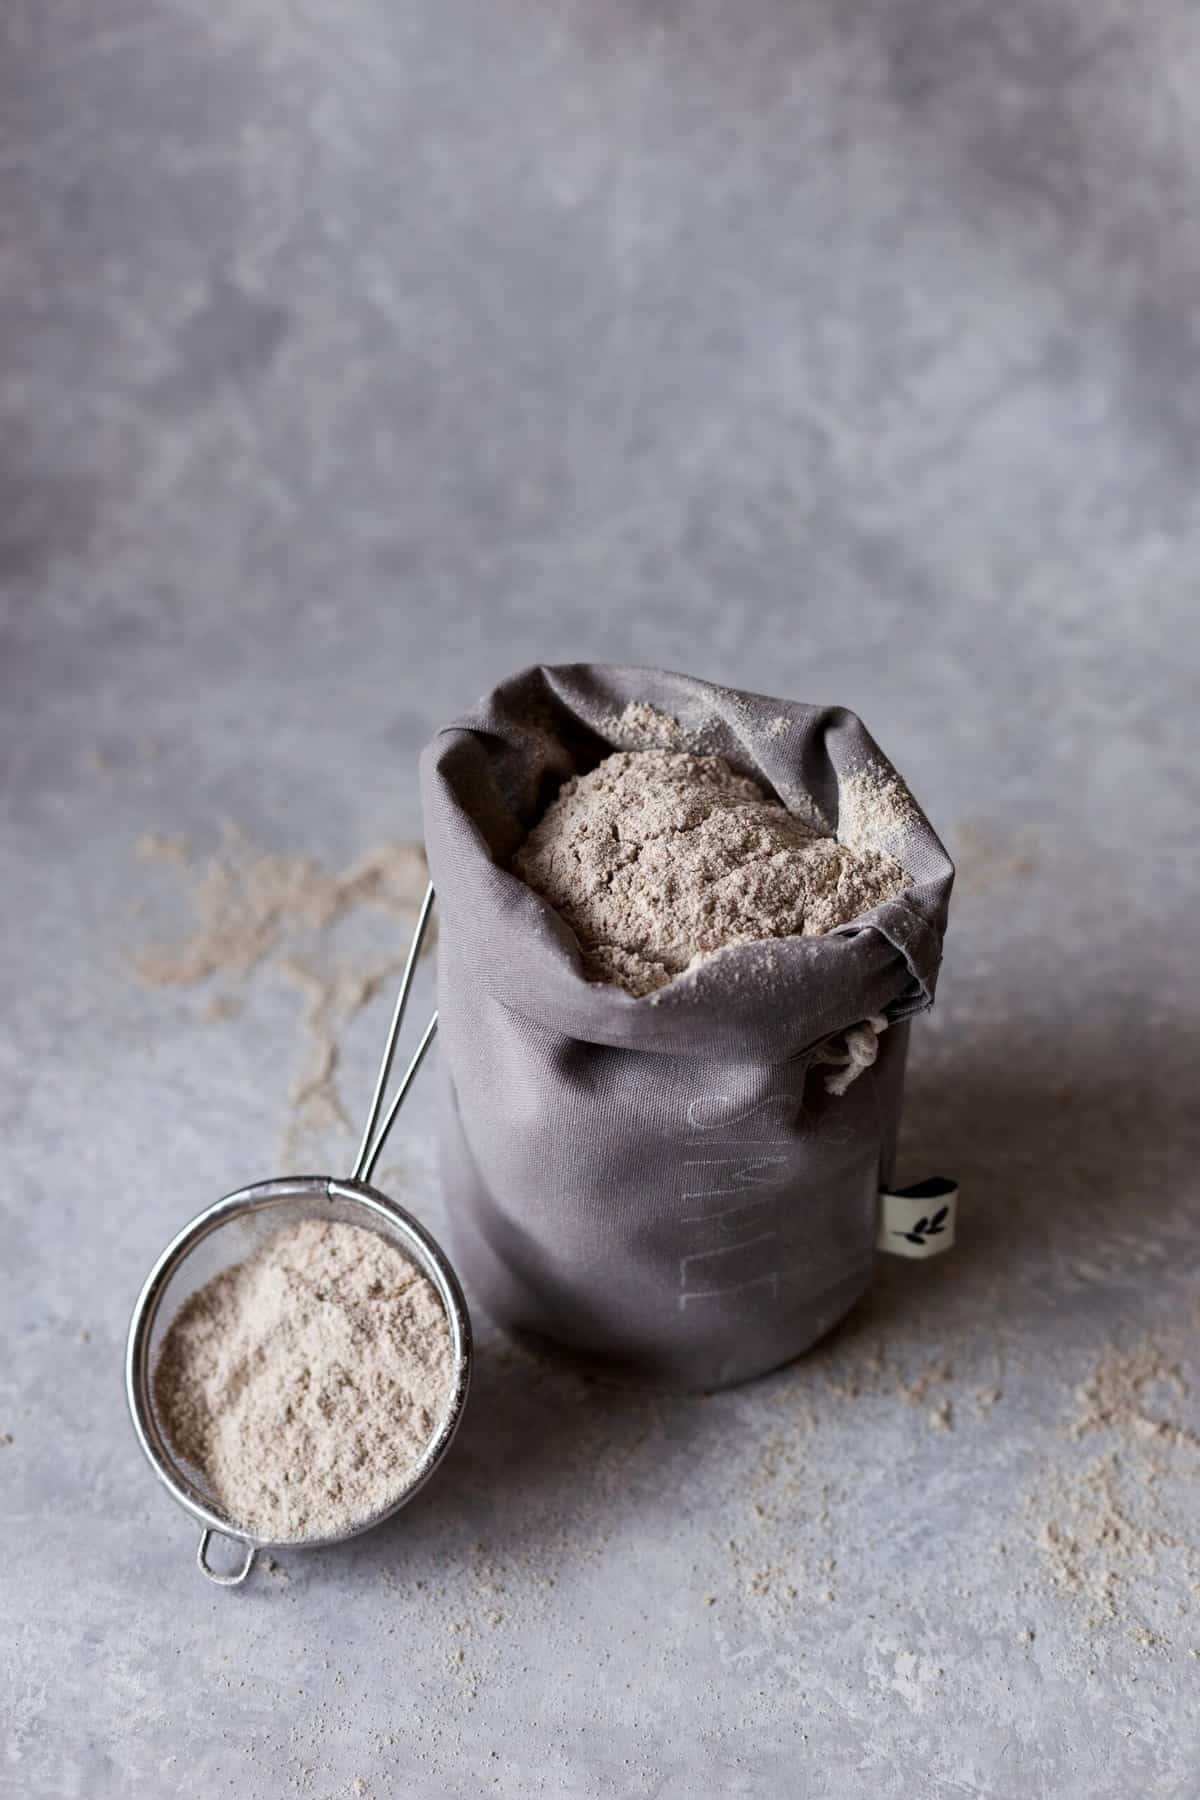 A bag of healthy flour.